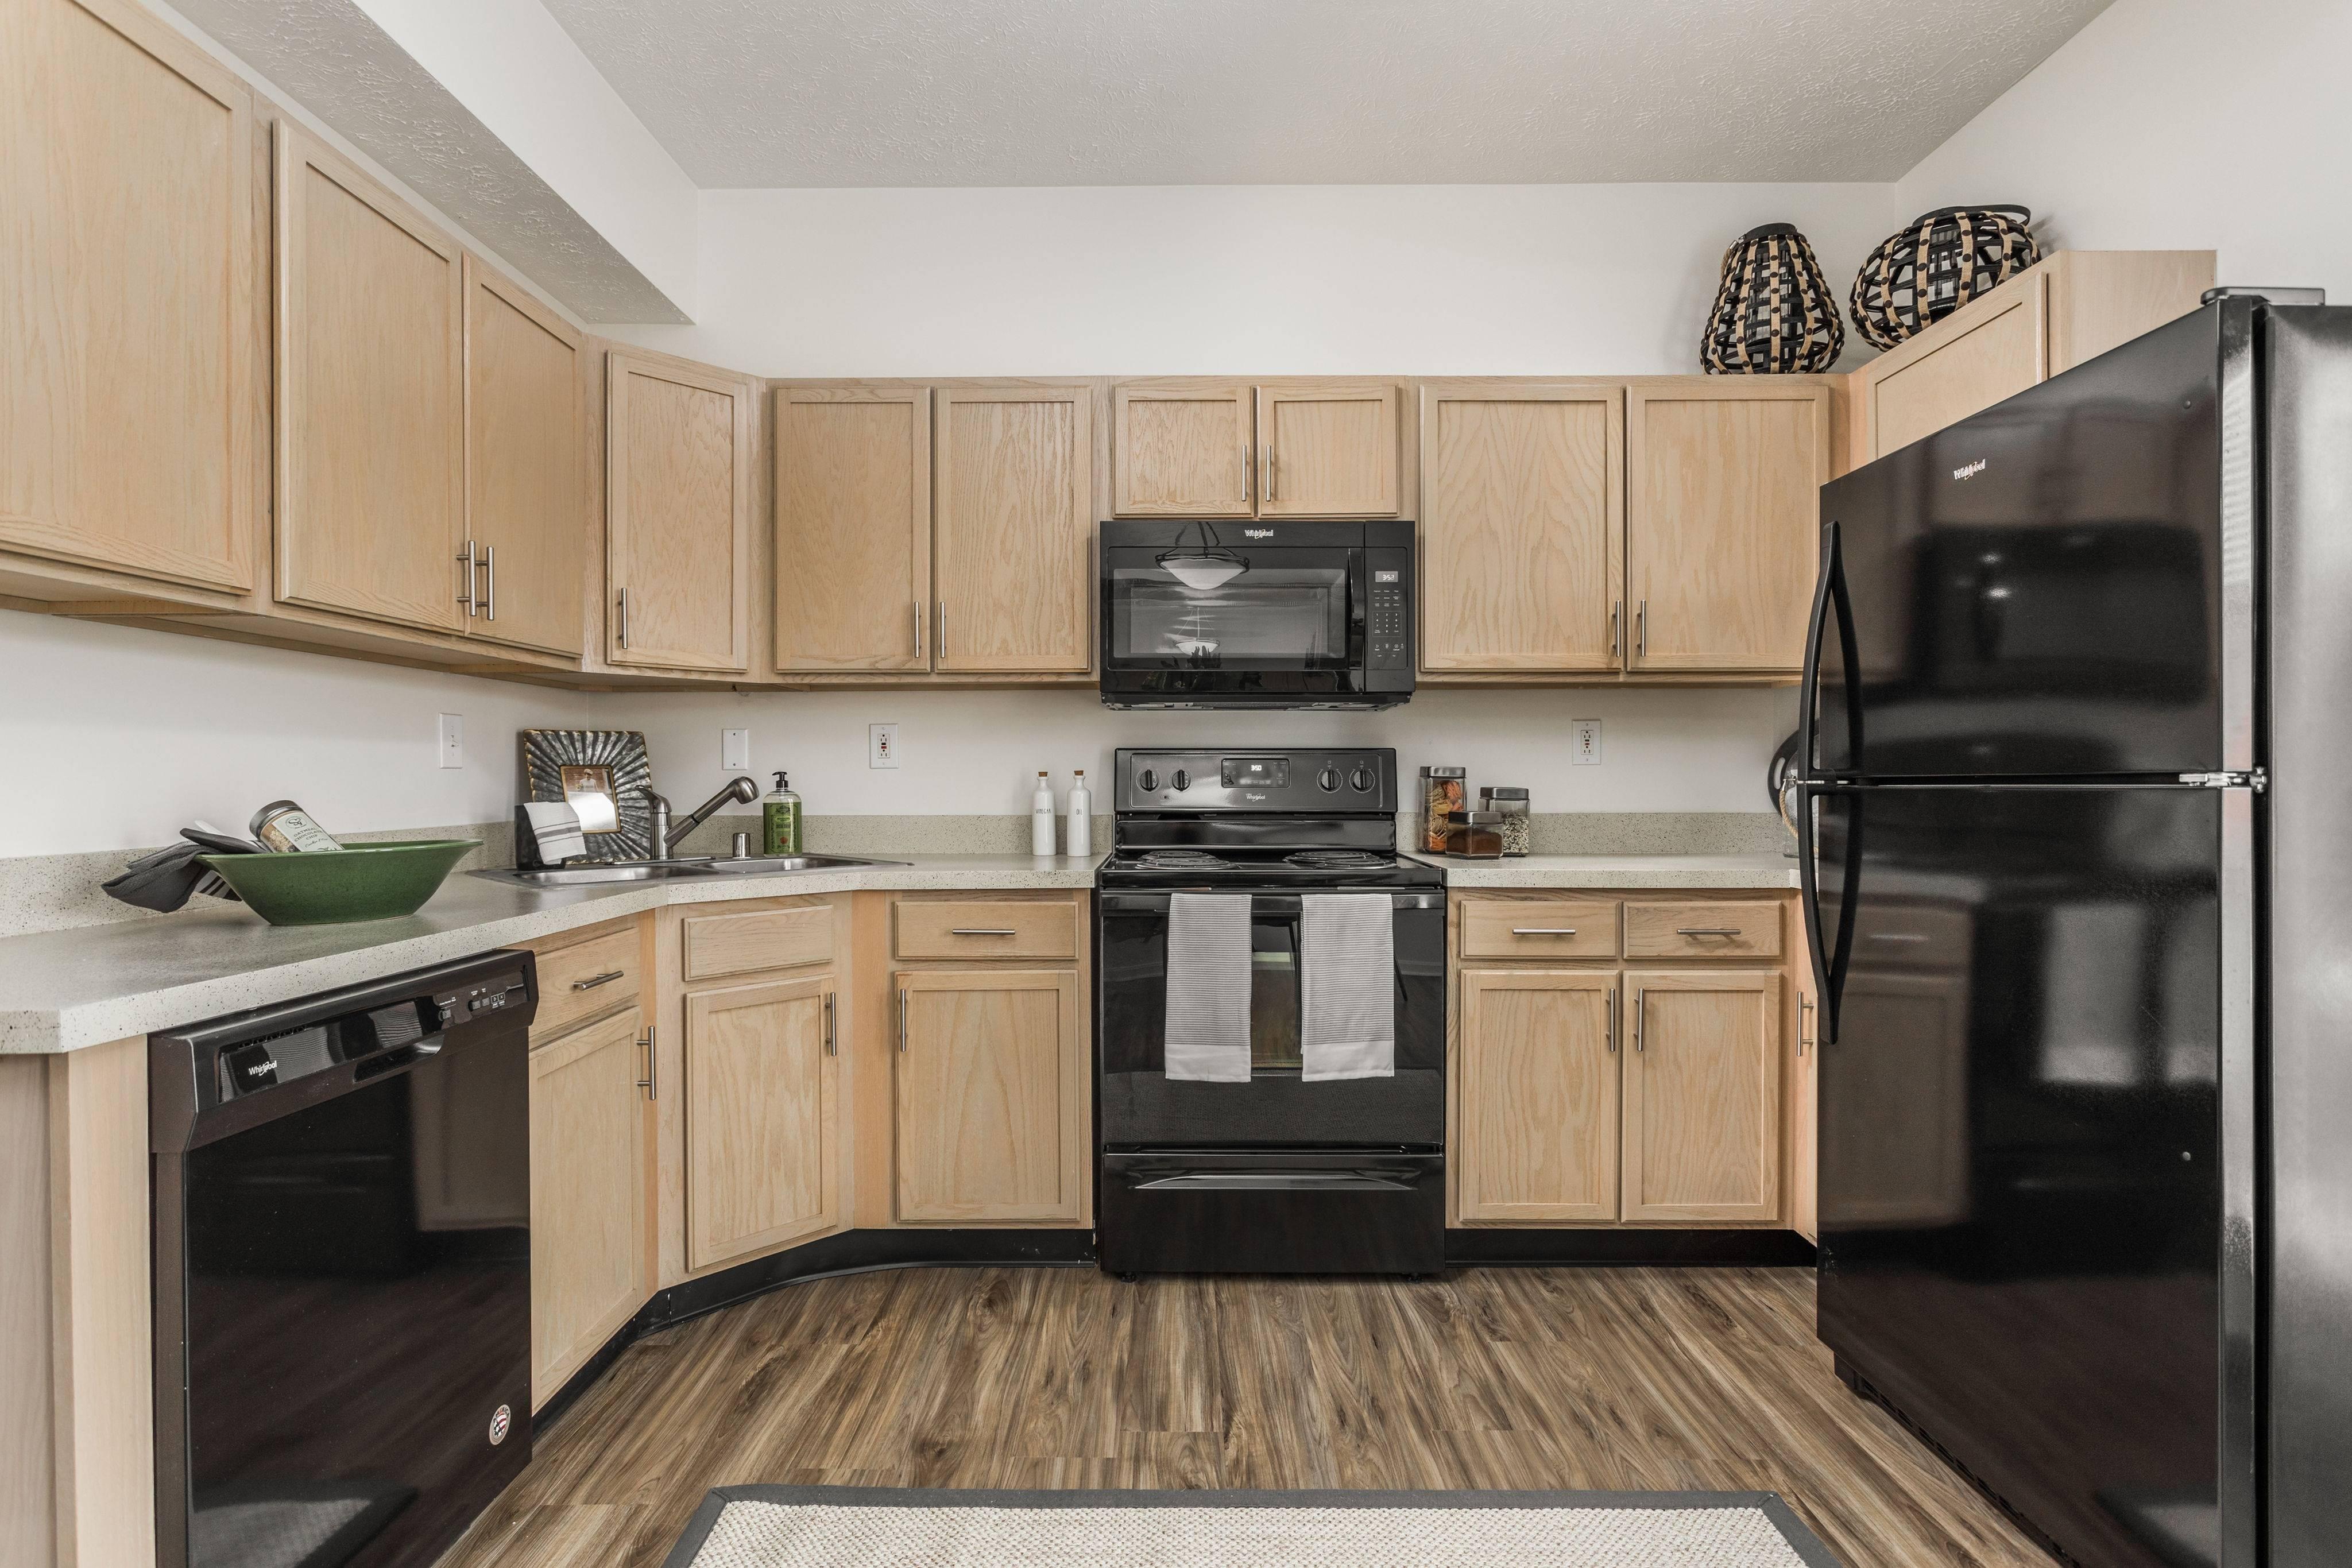 Upgraded Kitchen Appliances